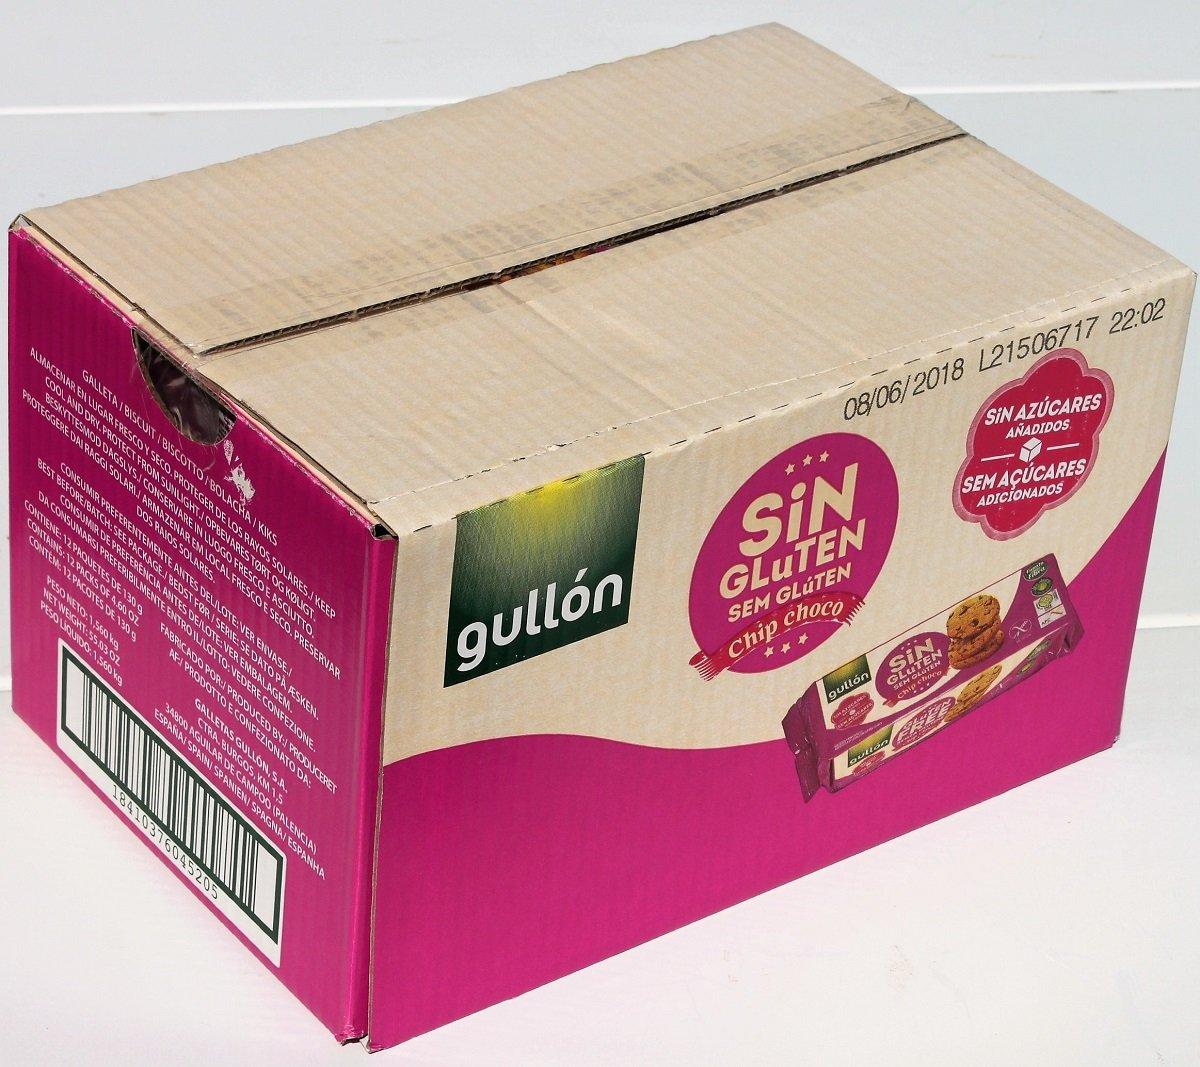 Gullón Chip Choco Galletas Sin Gluten Y Sin Azúcar Paquete ...